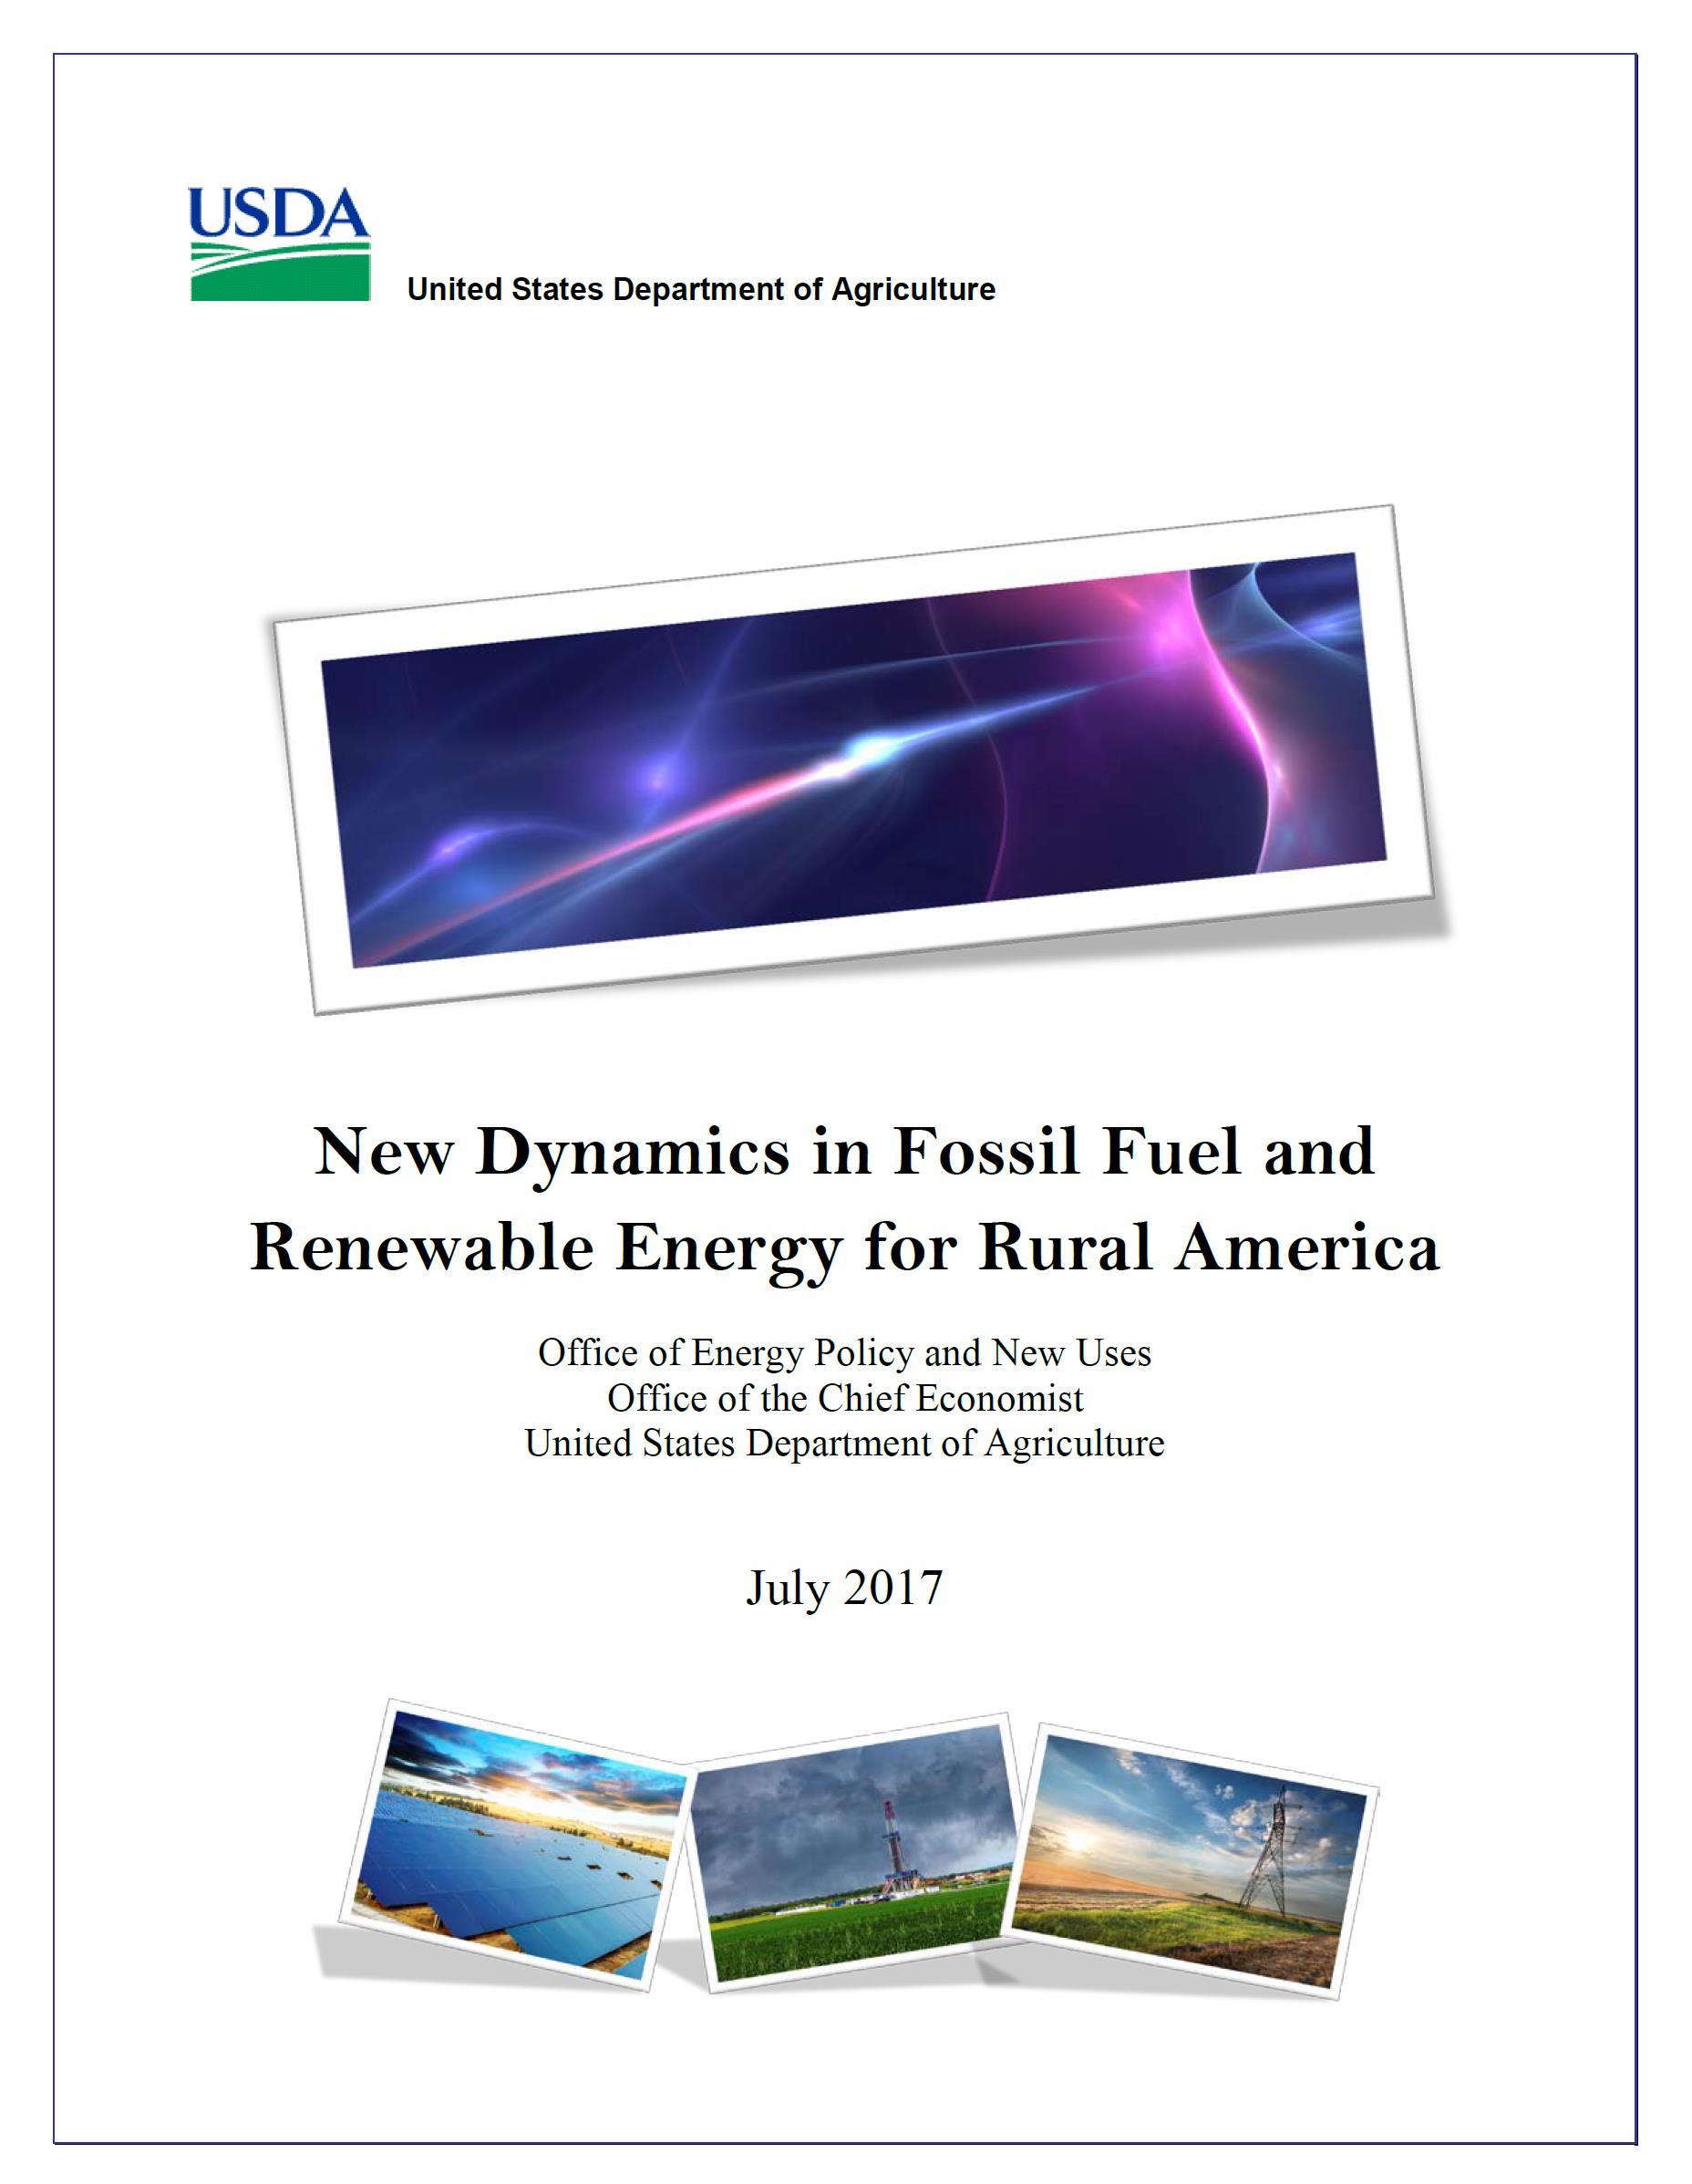 New Dynamics in Fossil Fuel.jpg